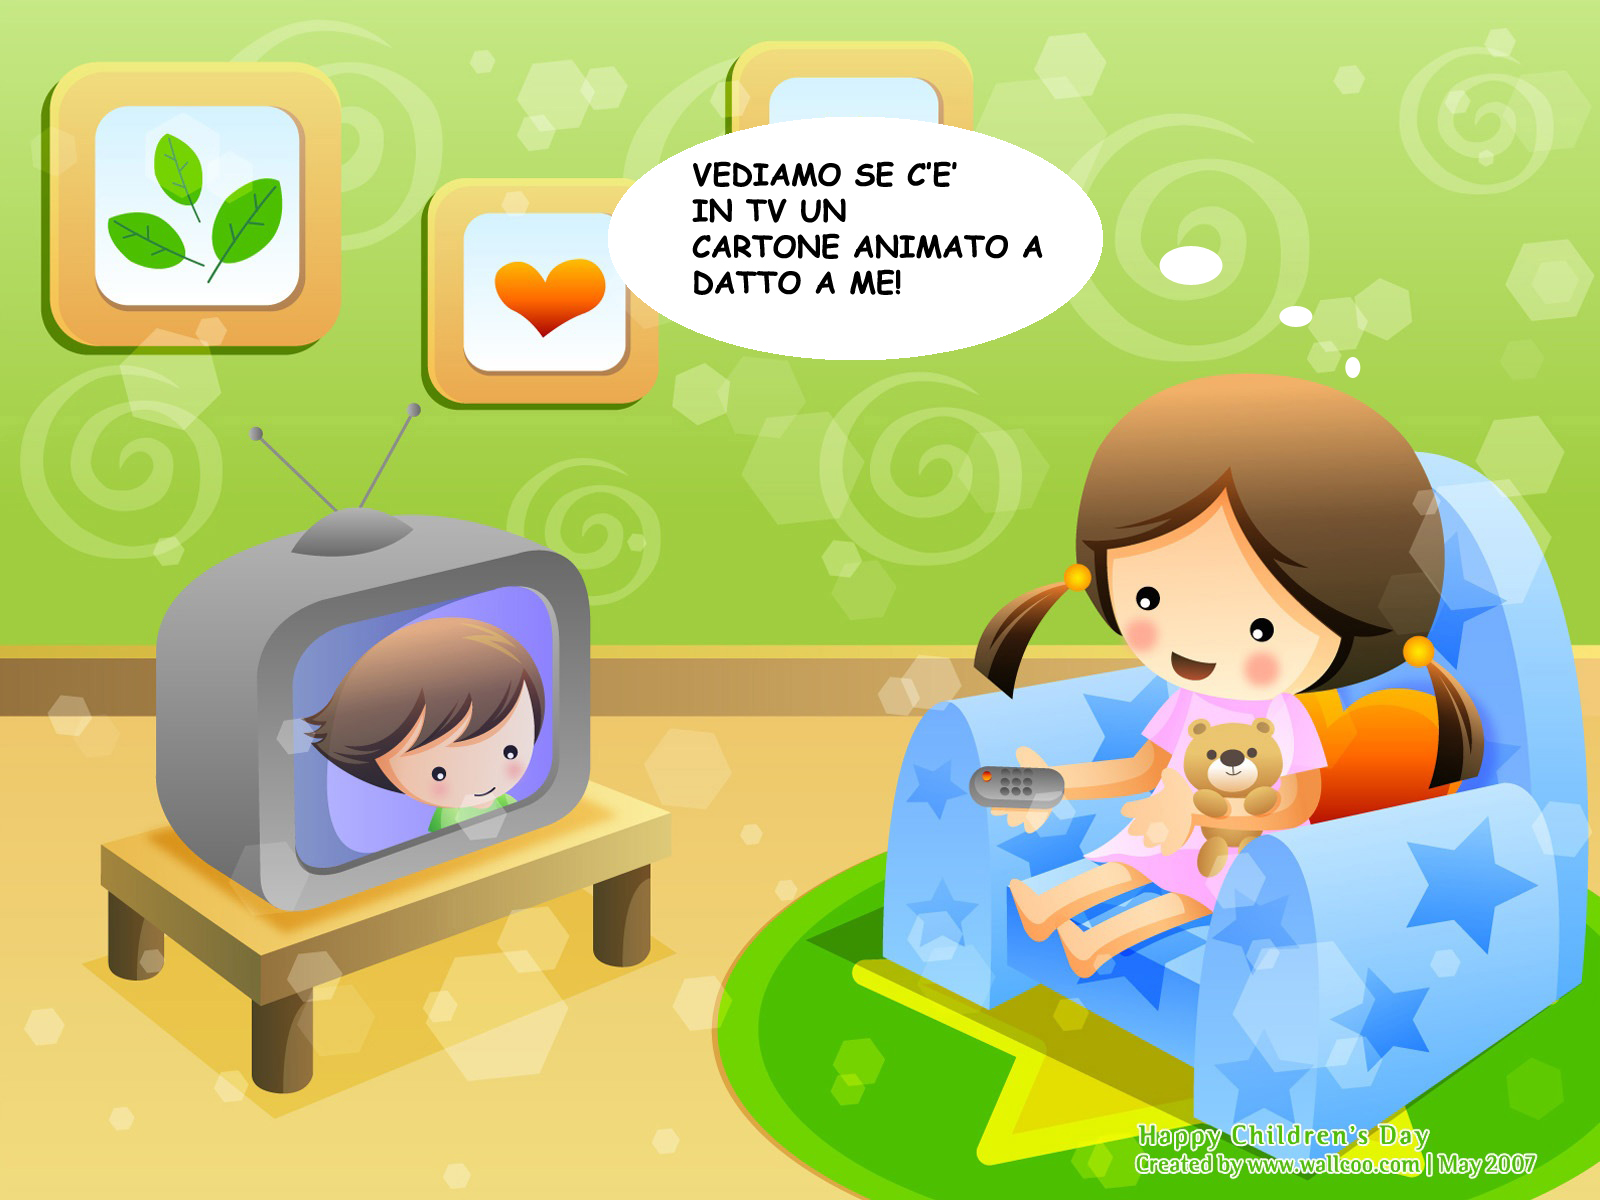 Diseducativo cartoni animati per educare